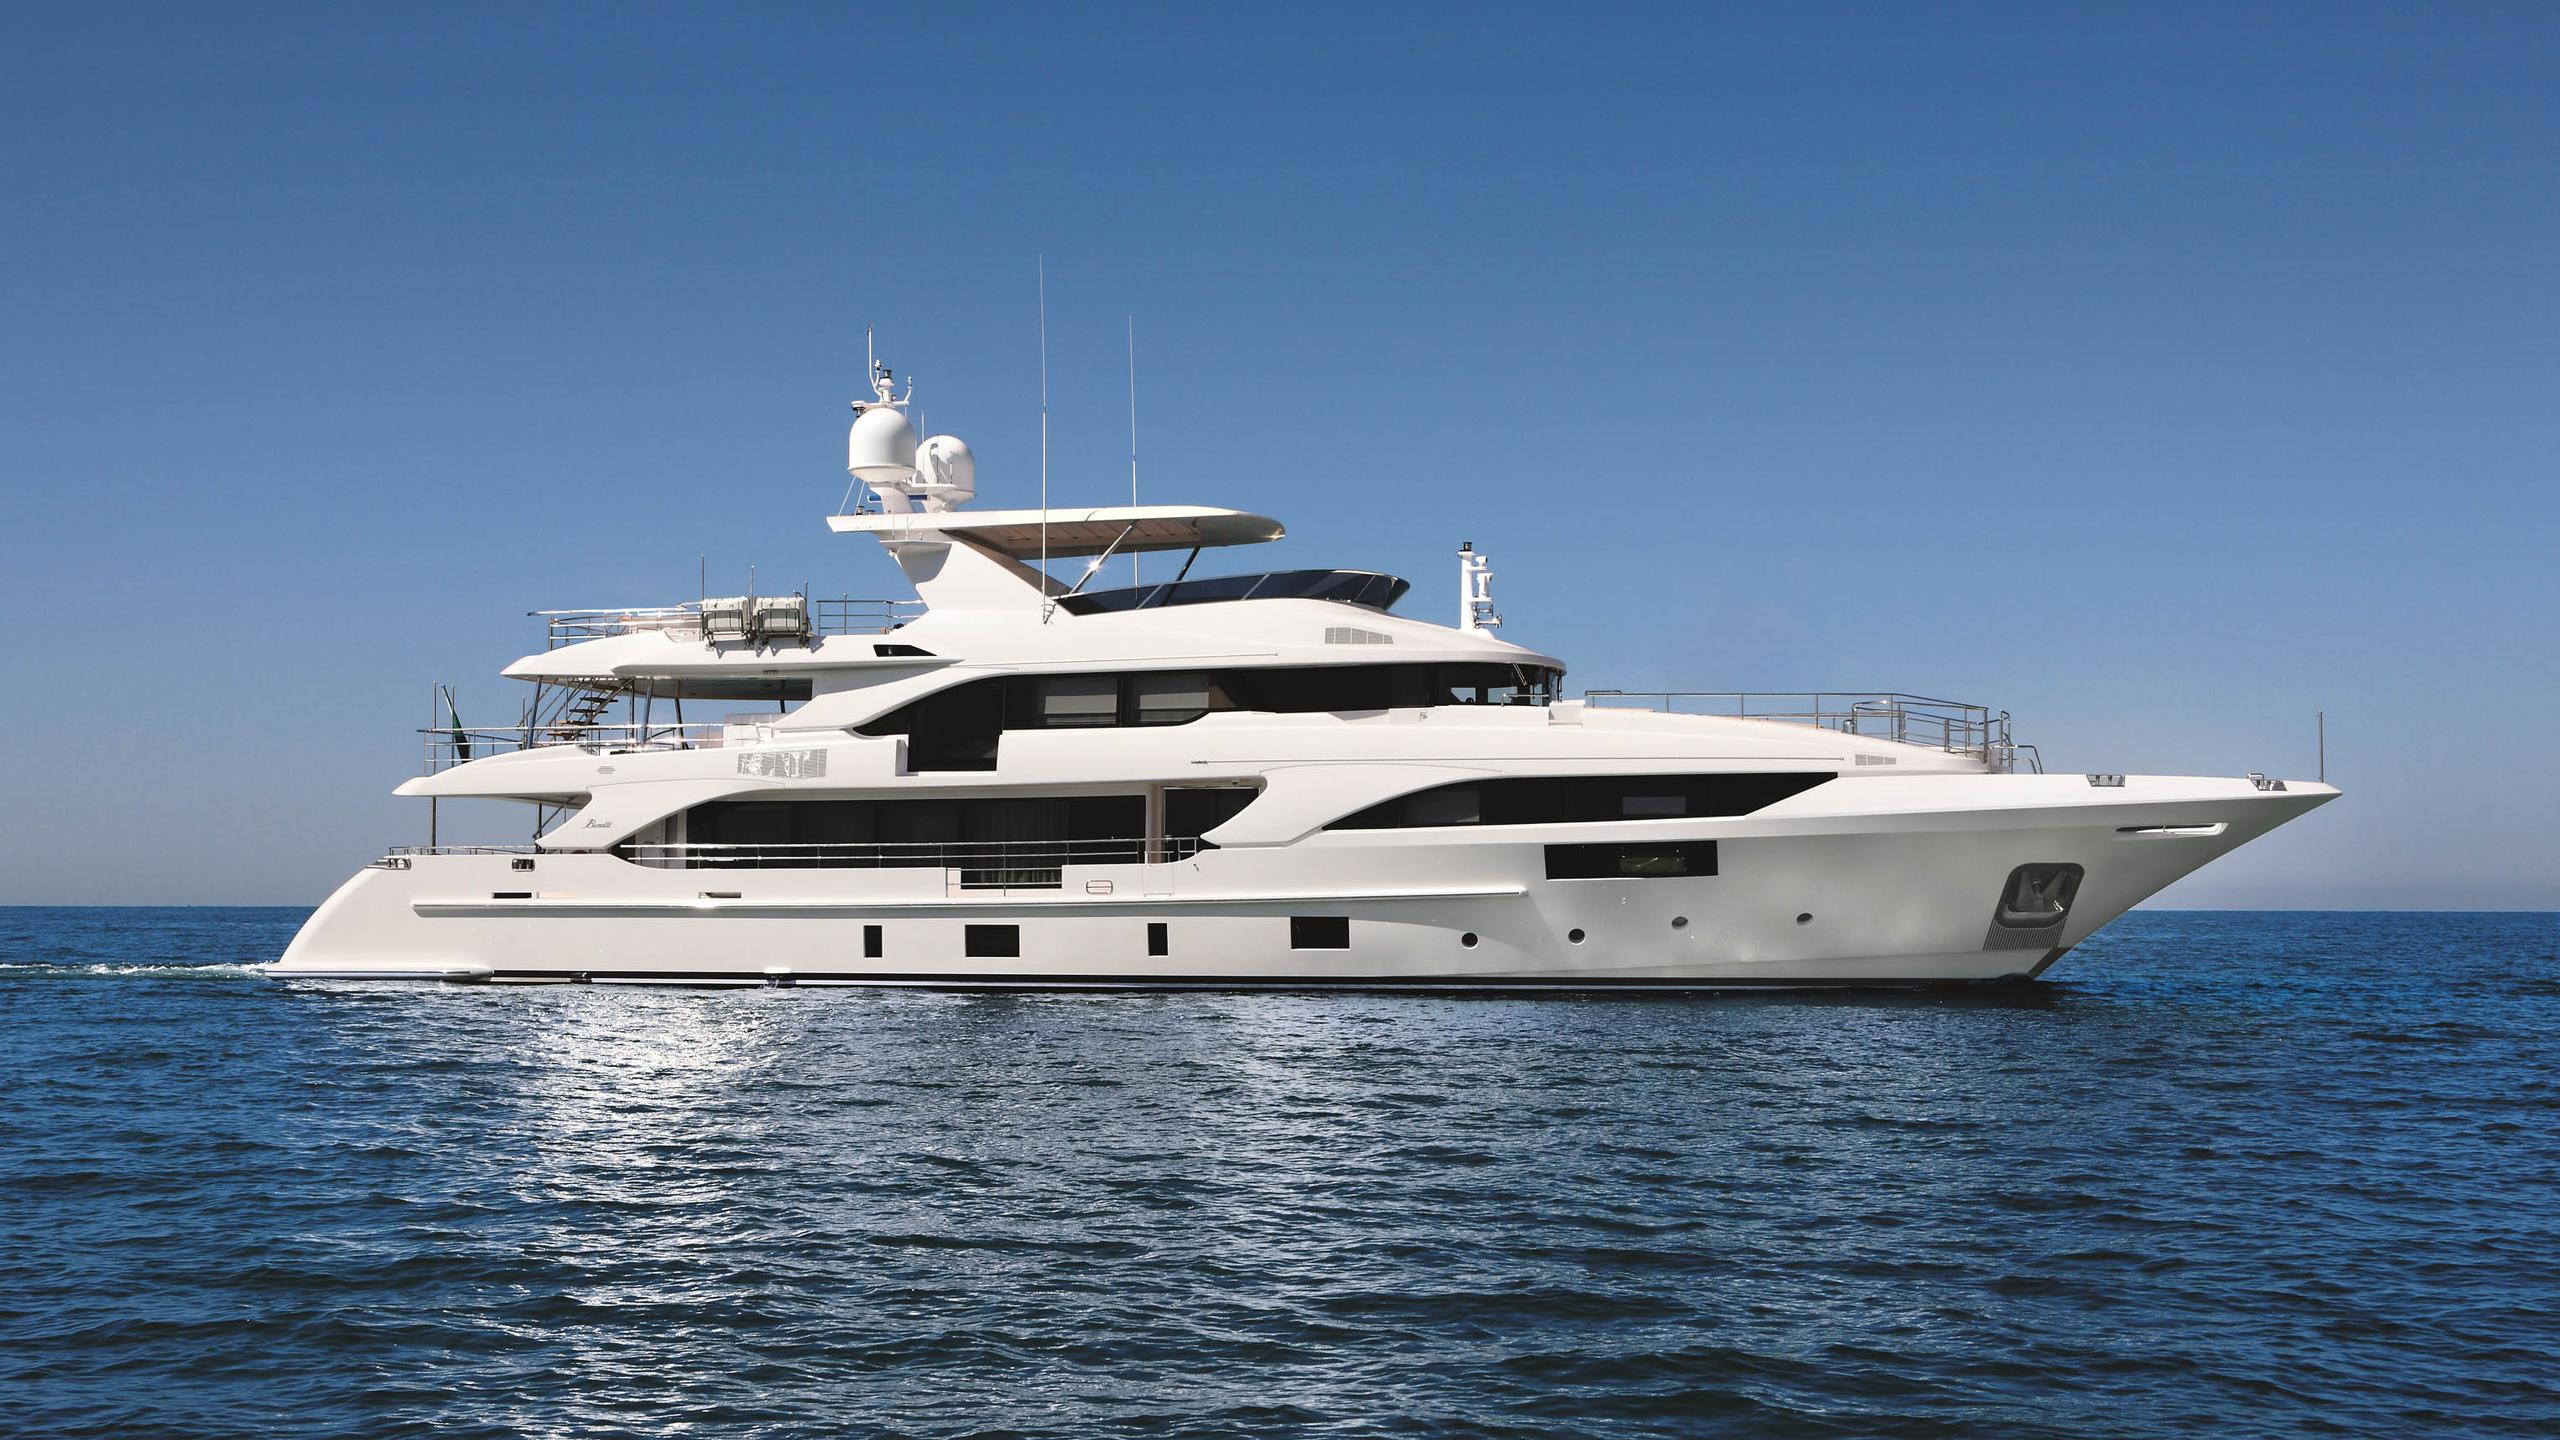 supreme 132 bs012 motoryacht benetti yachts 40m 2019 profile sistership